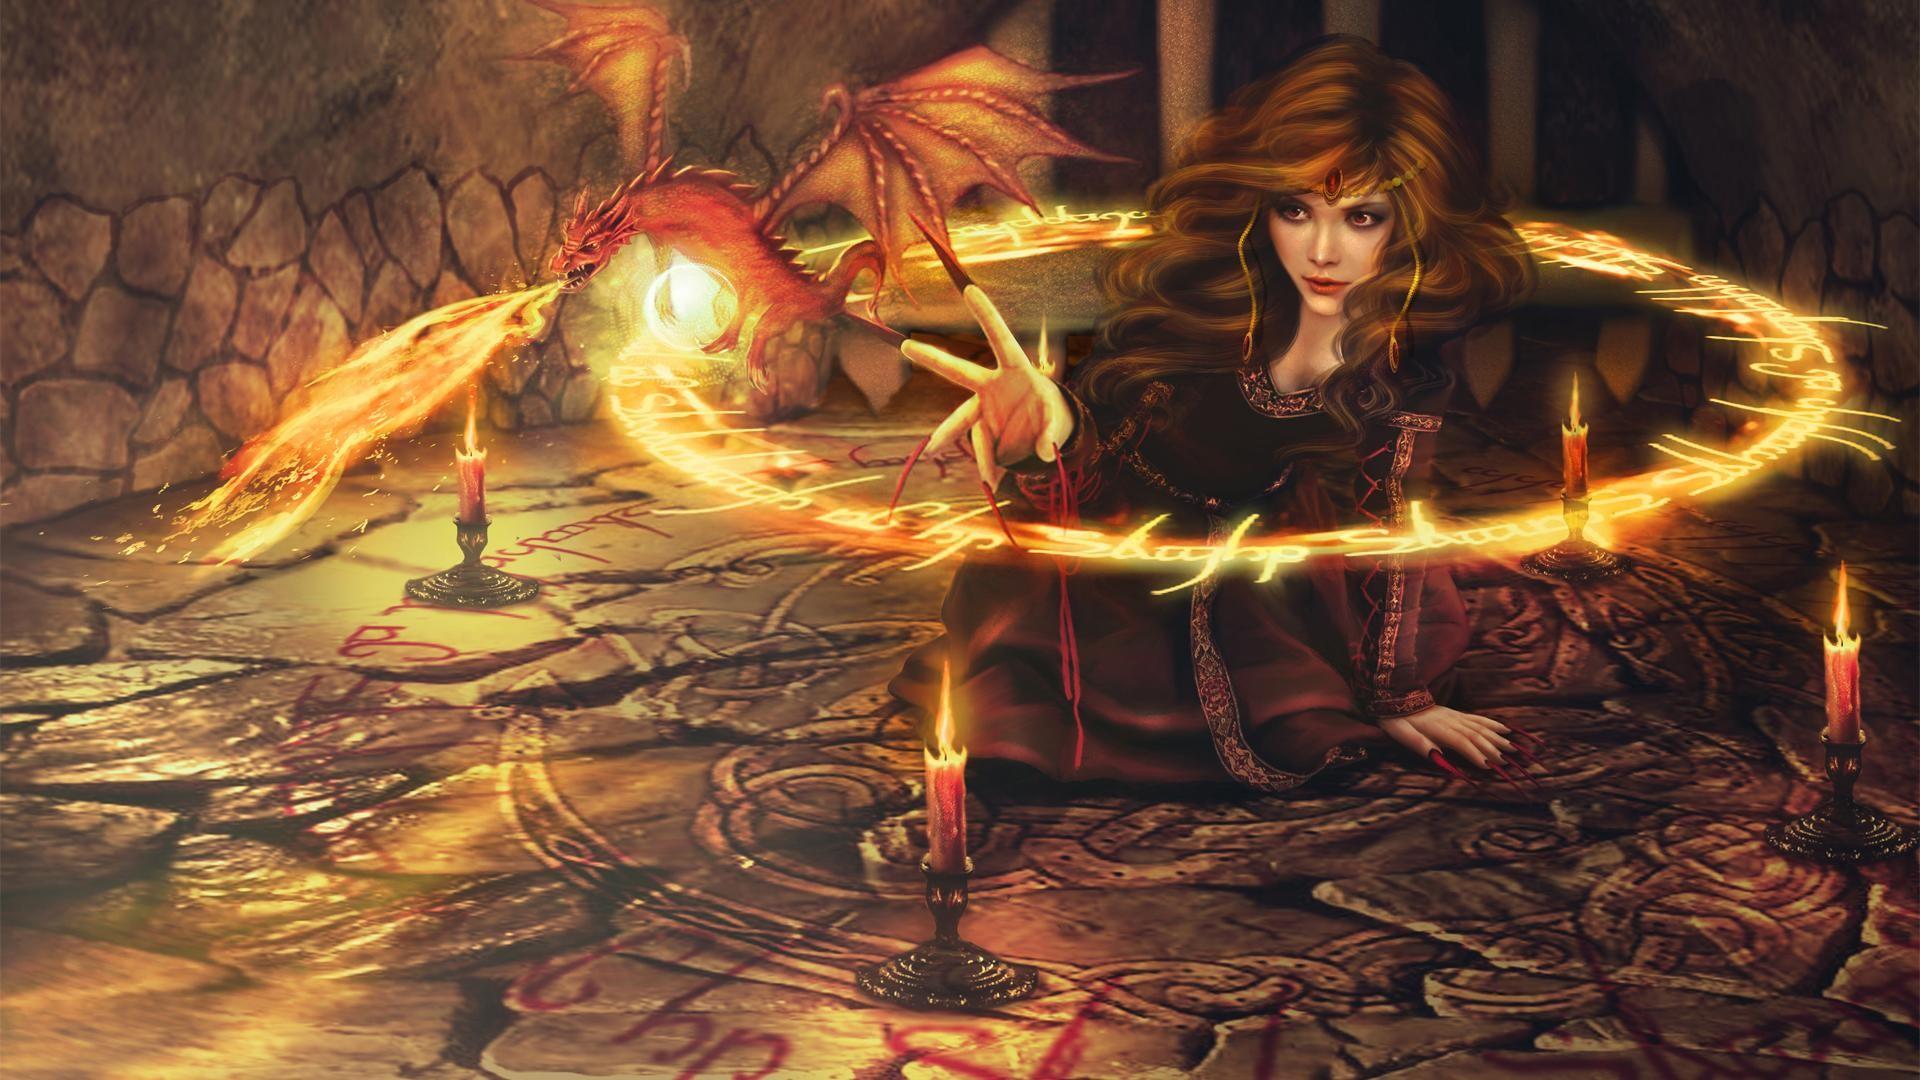 General 1920x1080 digital art fantasy art women dragon fire magic candles sorceress witch circle